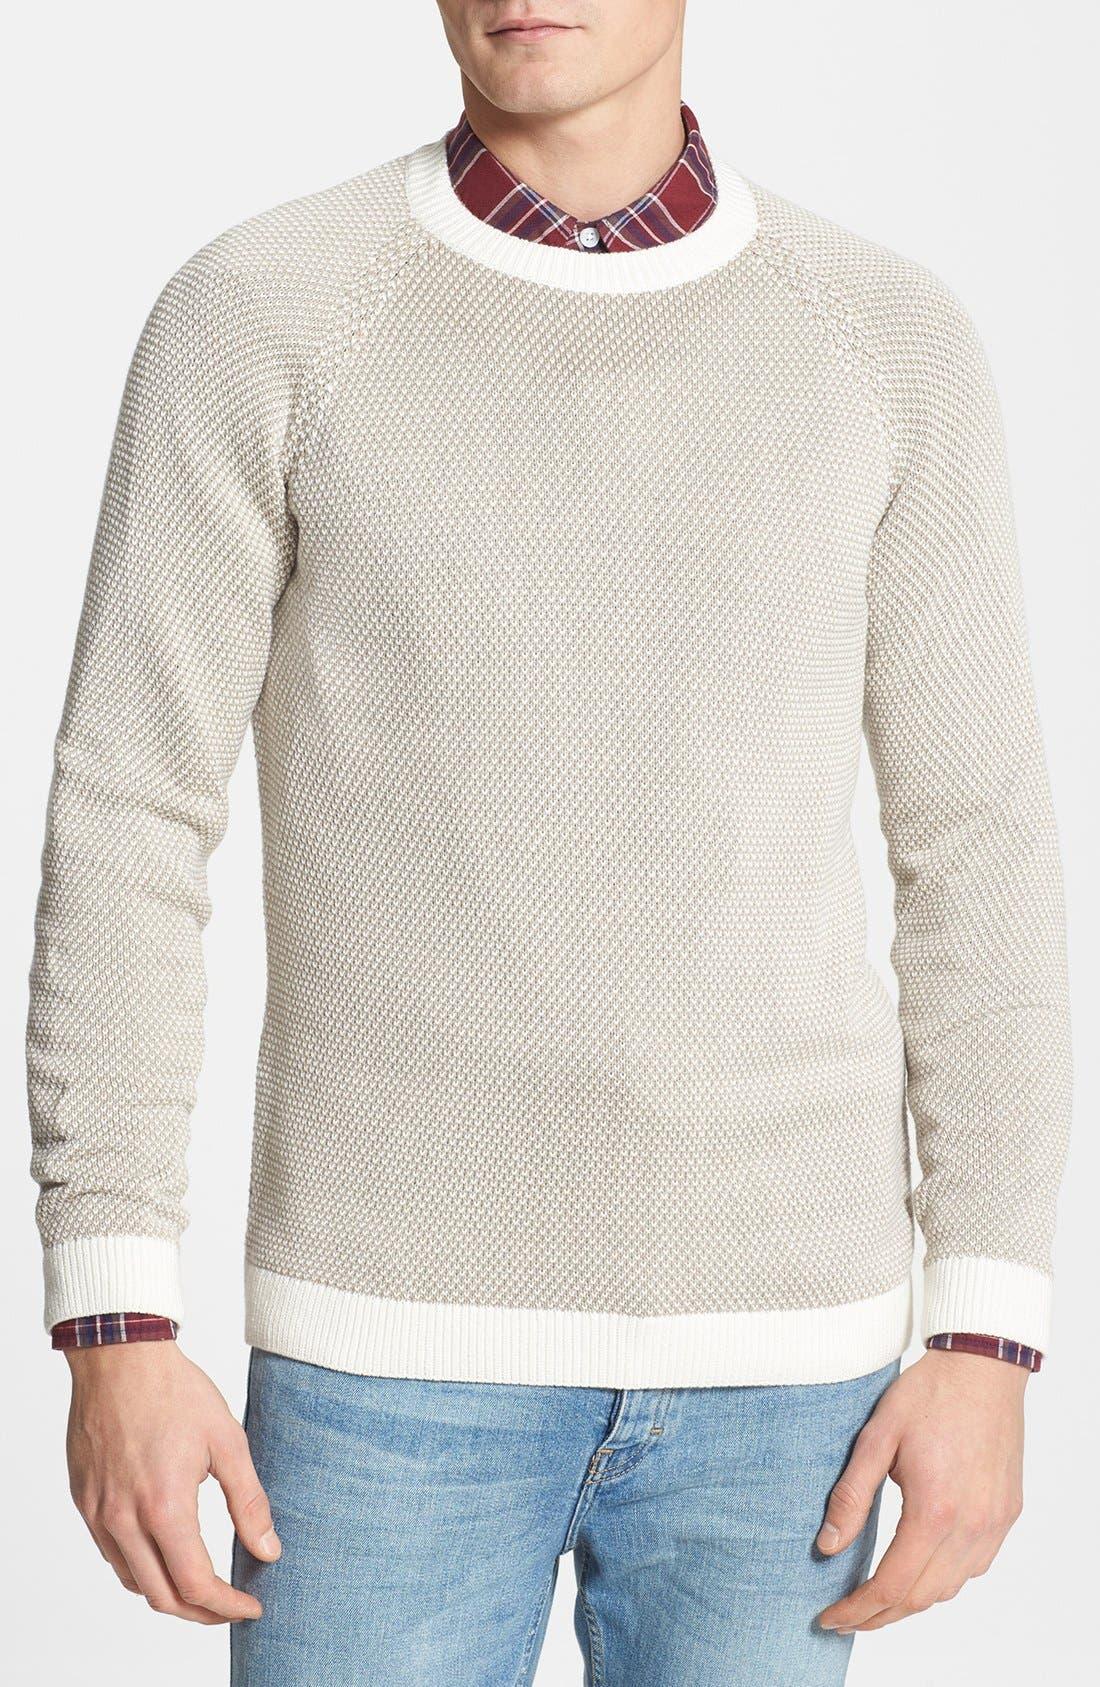 Alternate Image 1 Selected - Topman Reverse Knit Crewneck Sweater